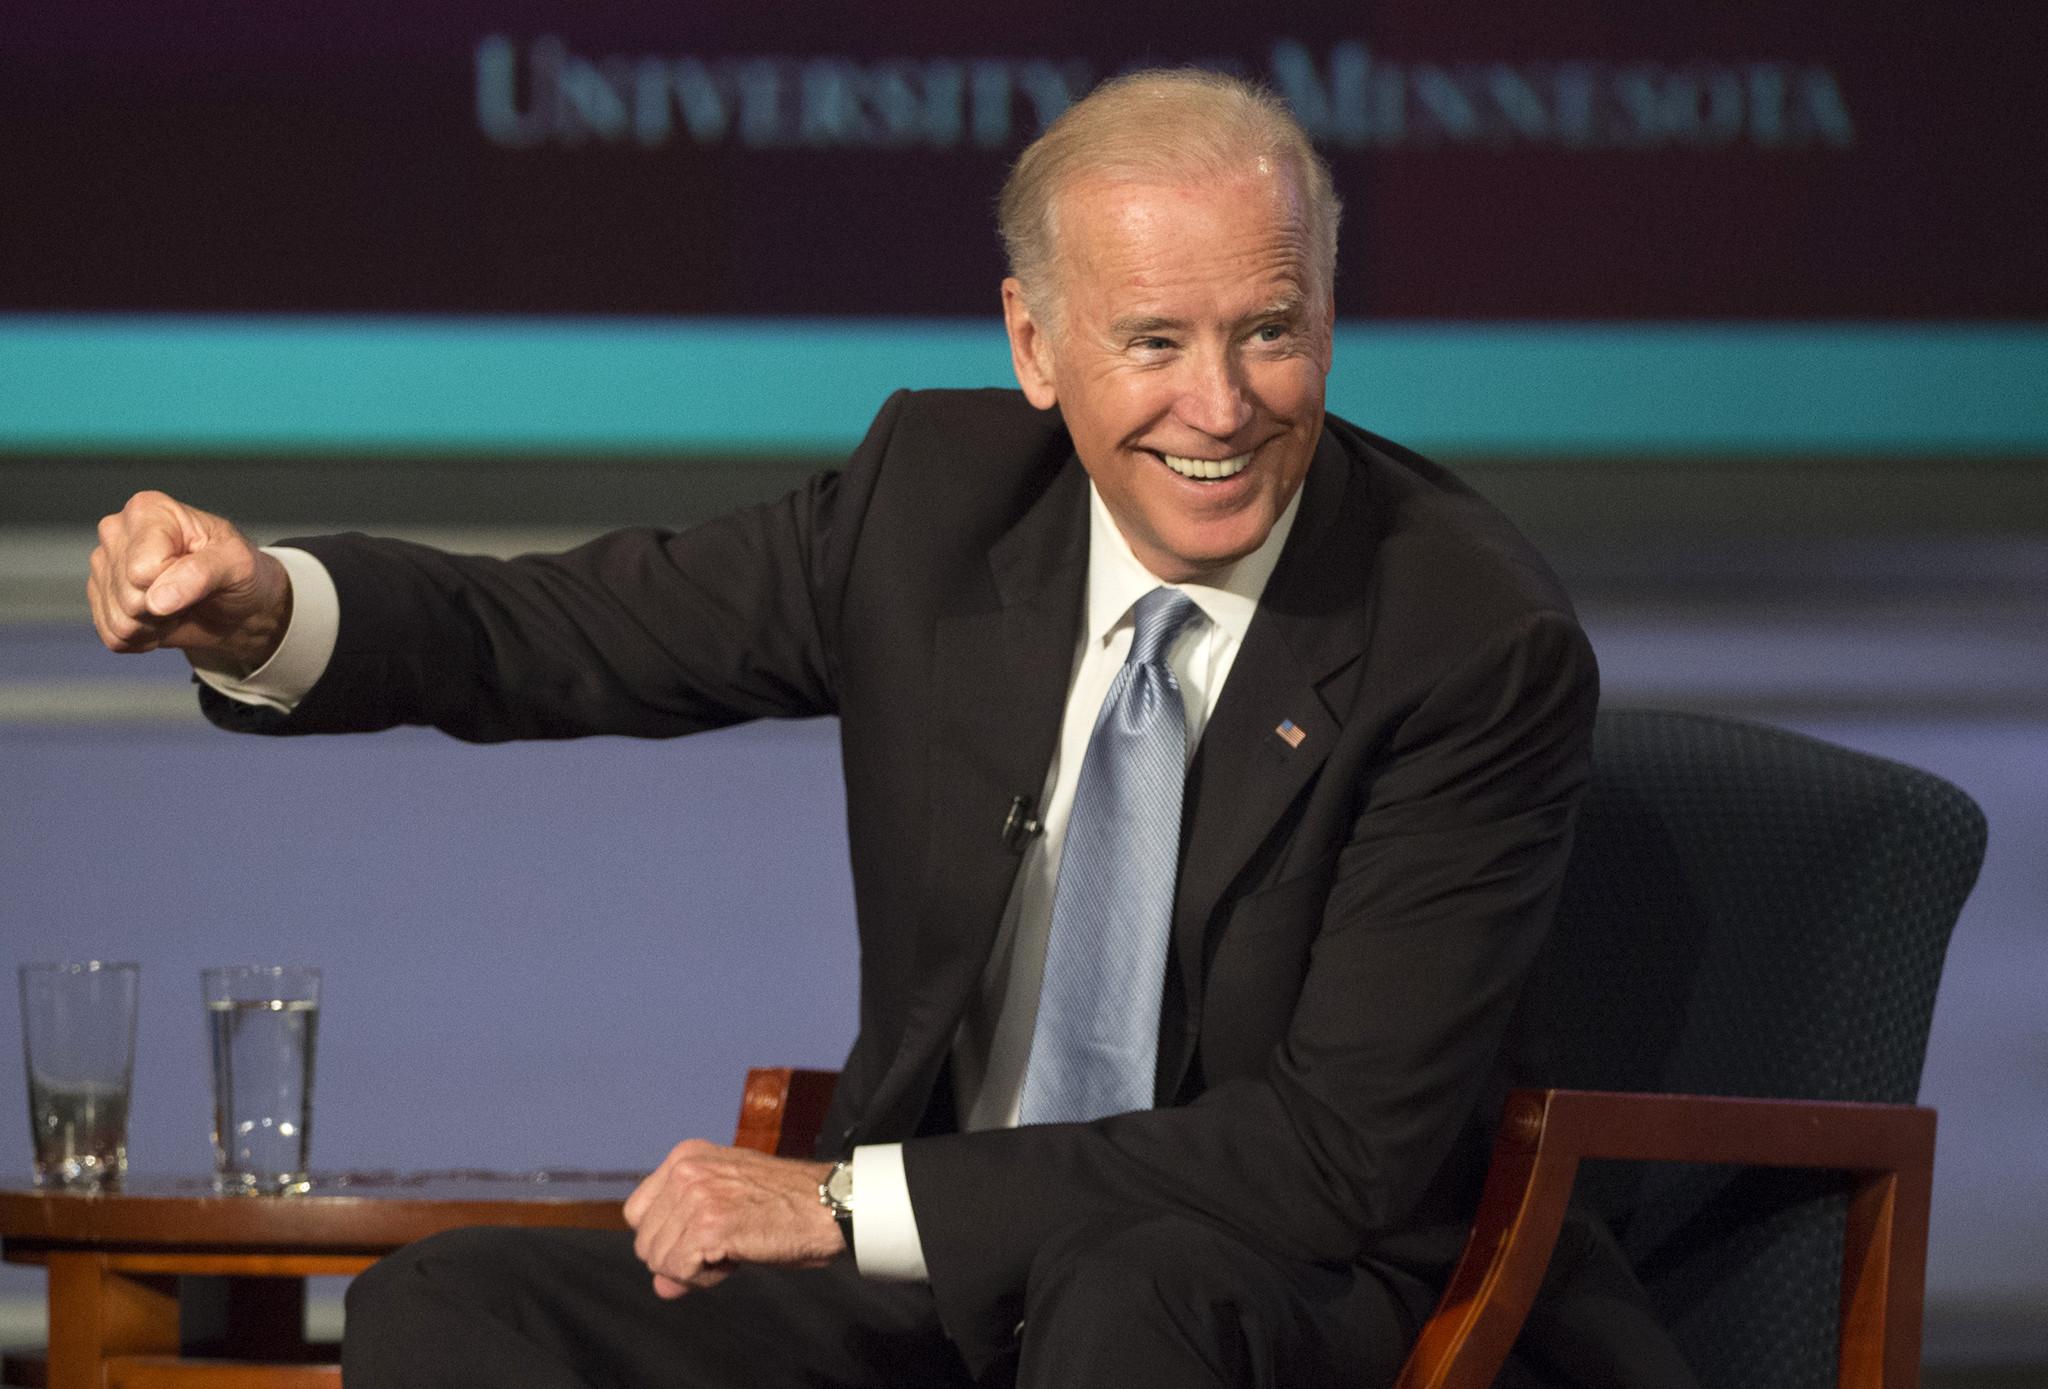 Biden offers new account of his role in bin Laden raid